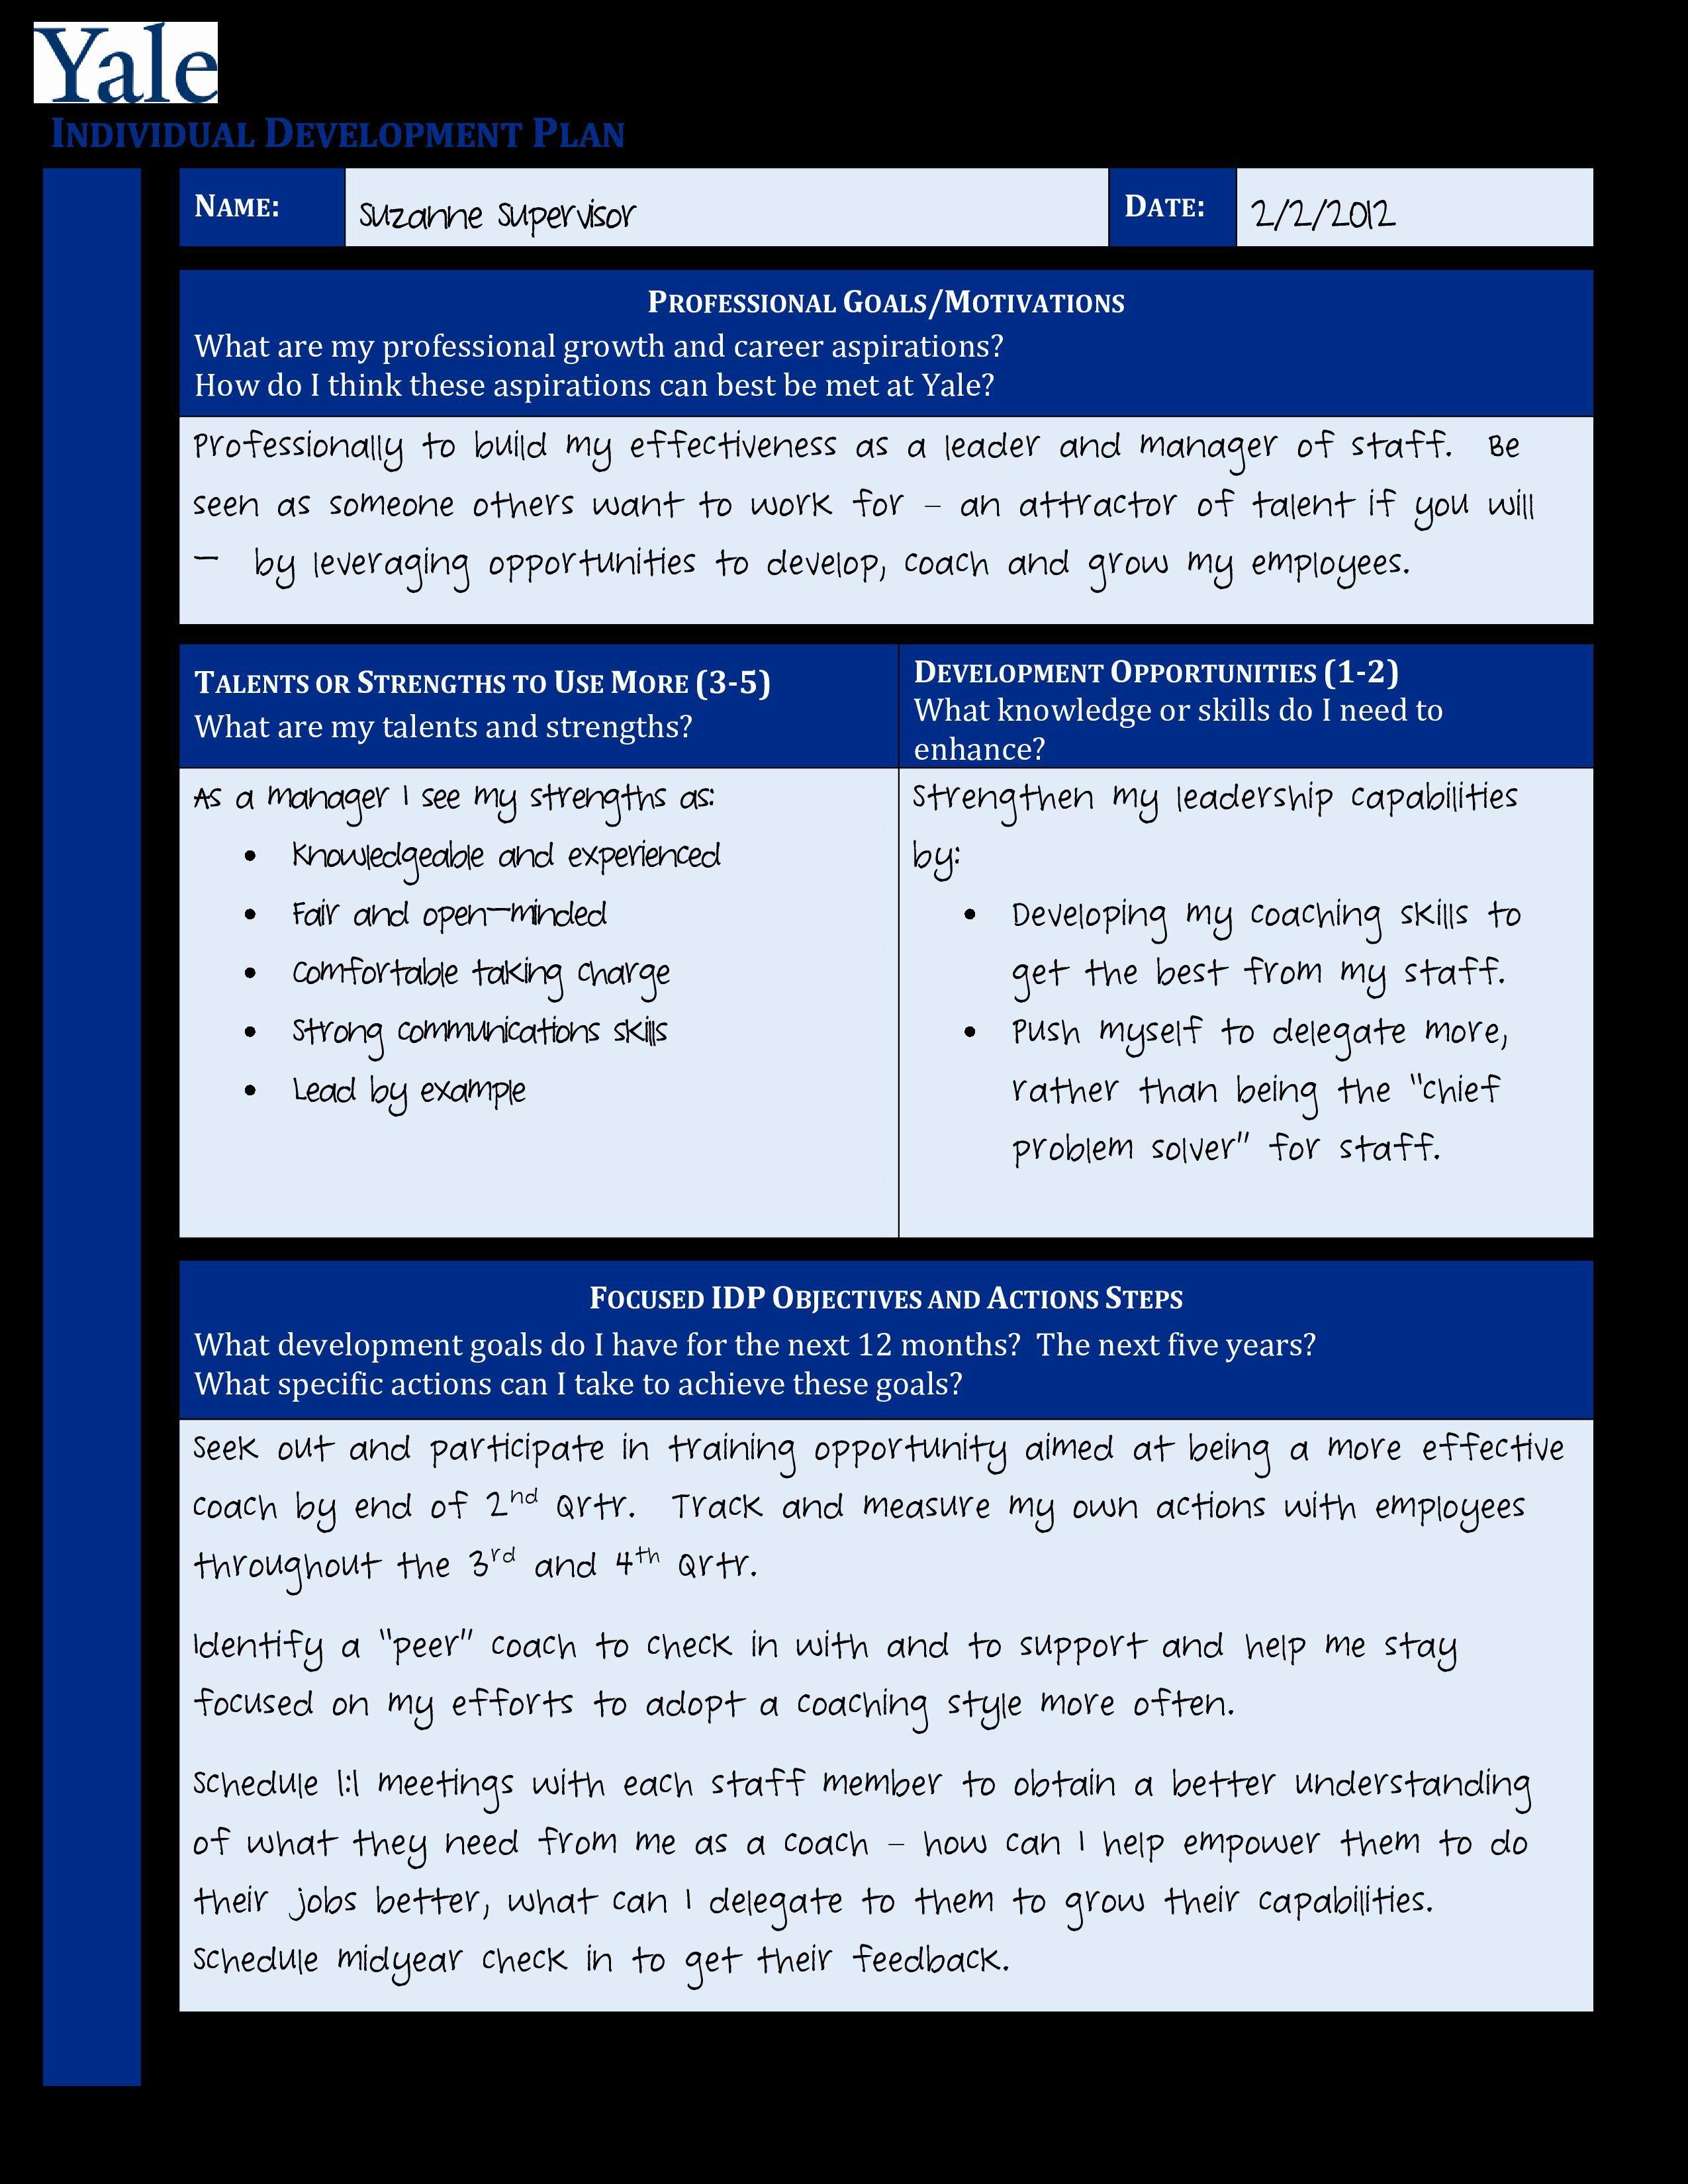 007 Surprising Professional Development Plan Template Pdf Picture  Sample ExampleFull